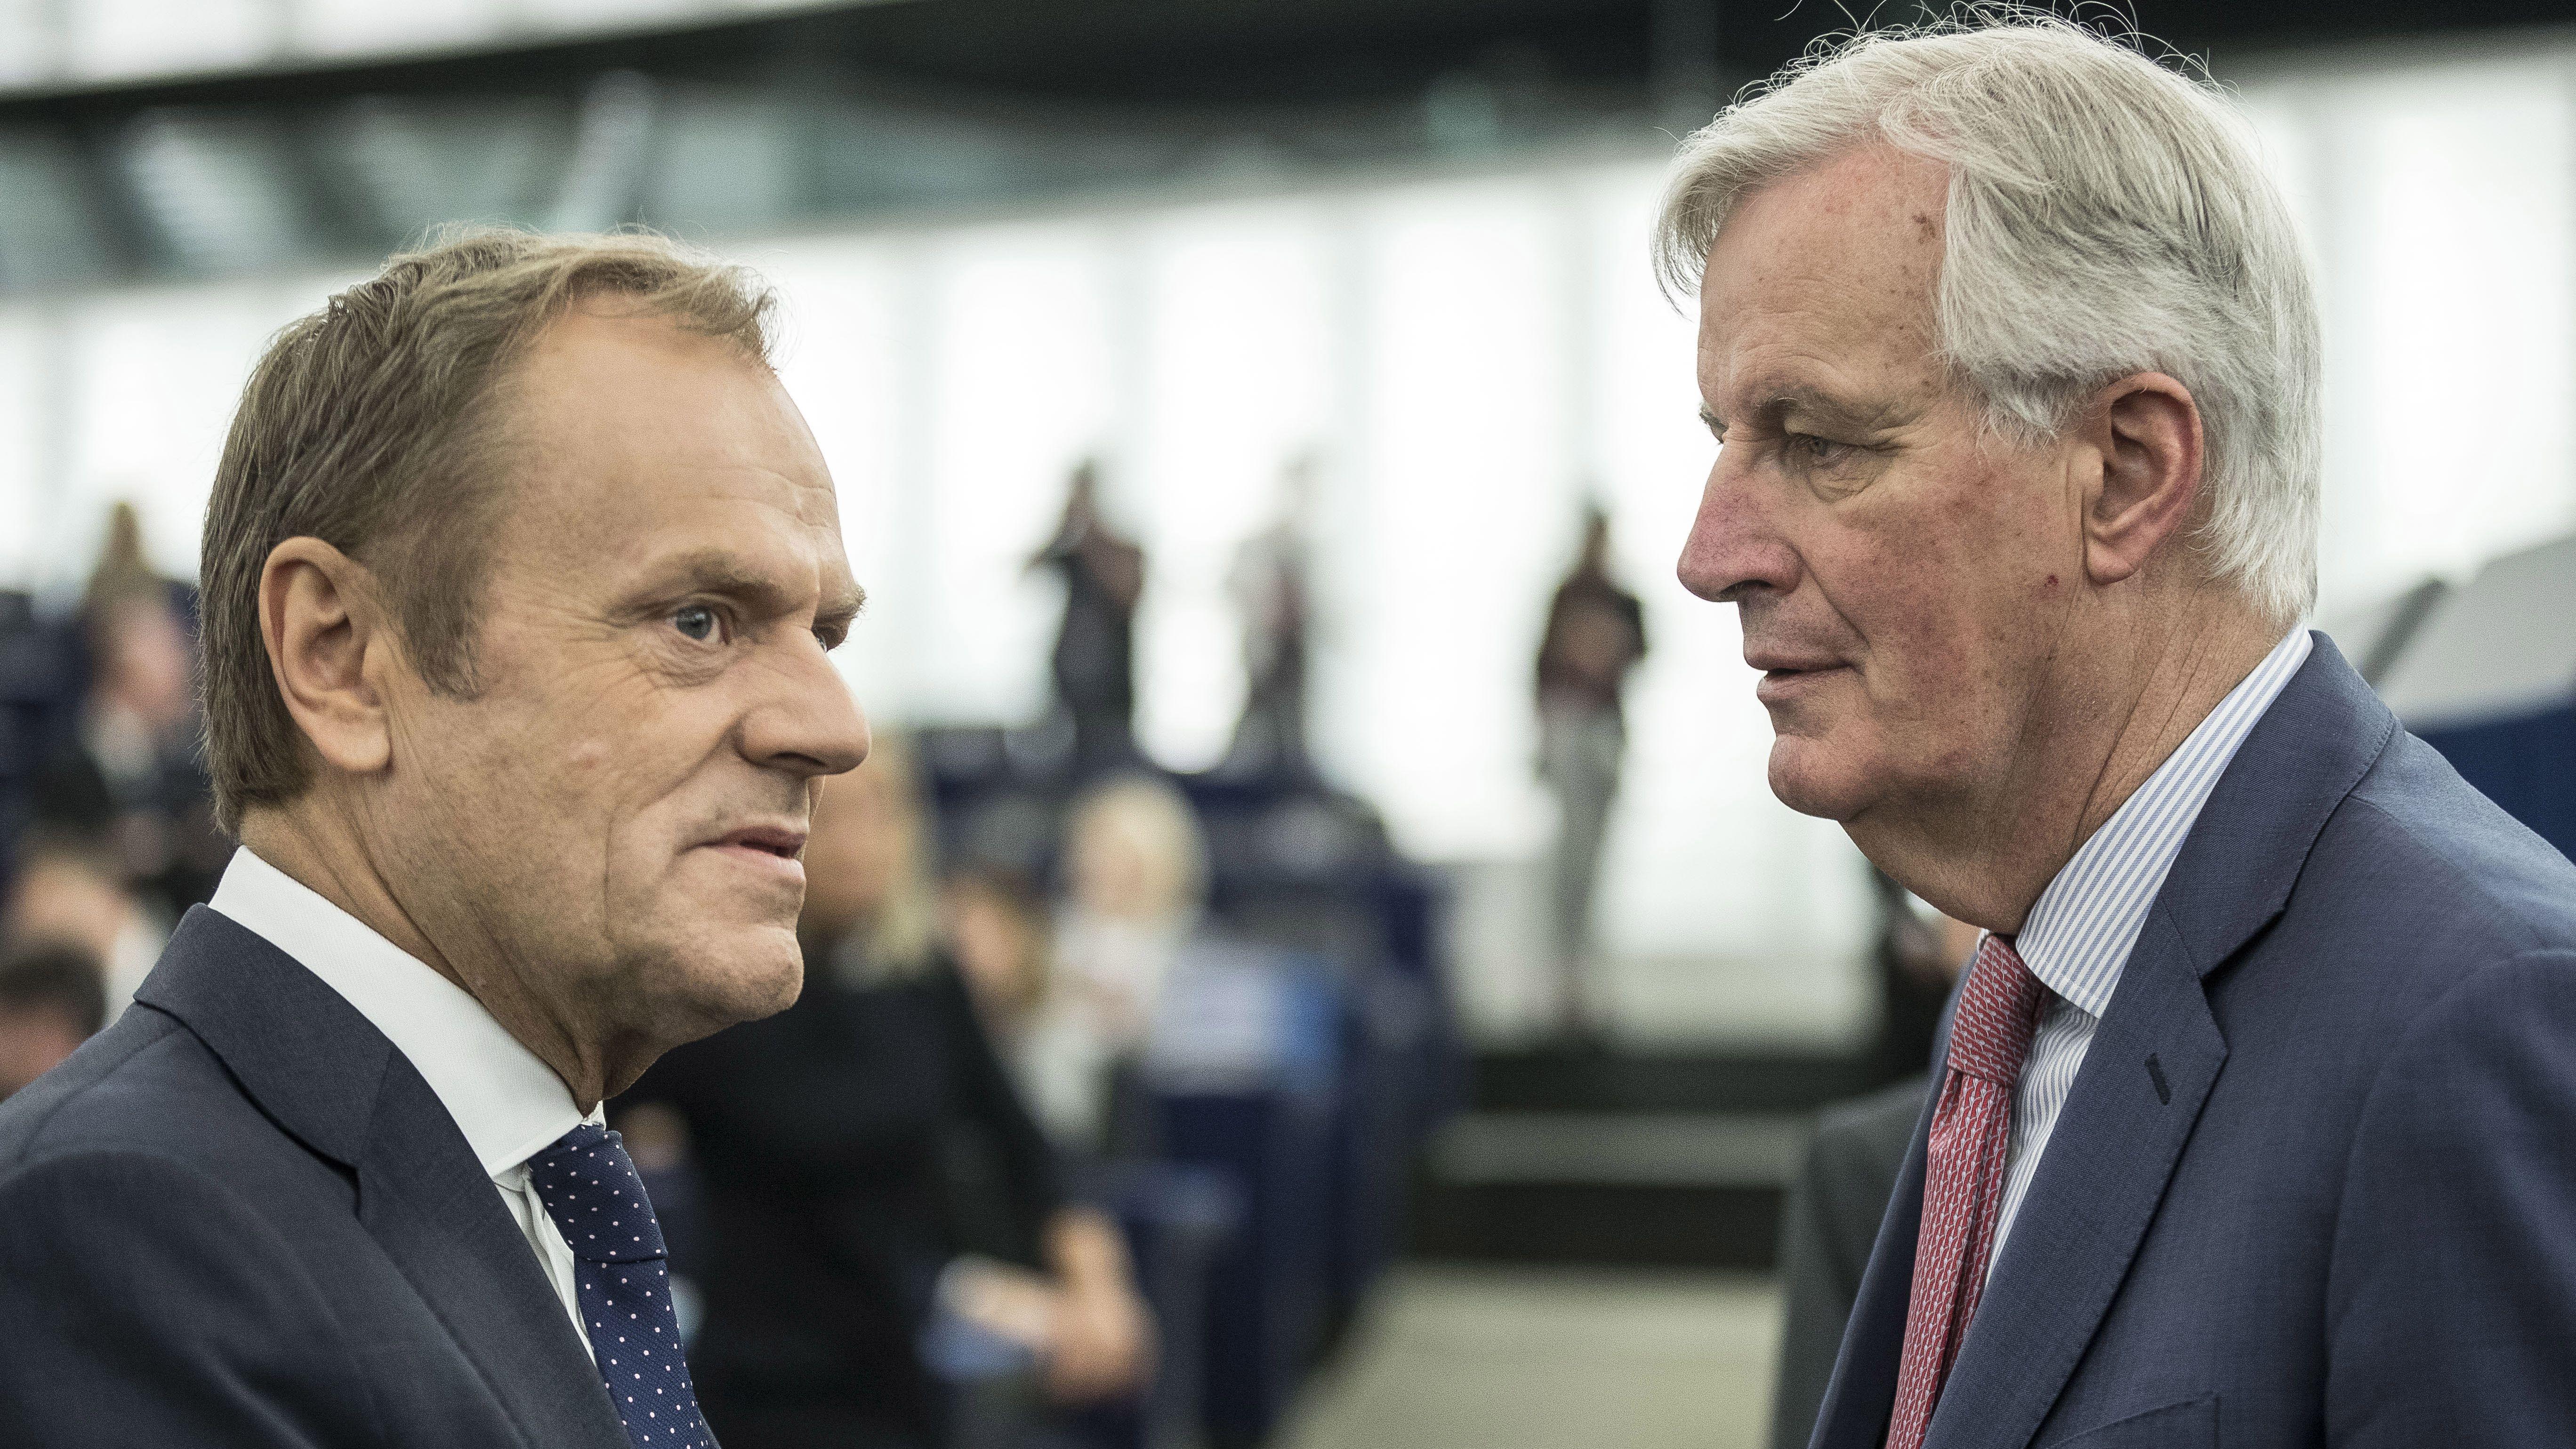 EU-Ratspräsident Donald Tusk und Chefunterhändler Michel Barnier im Gespräch